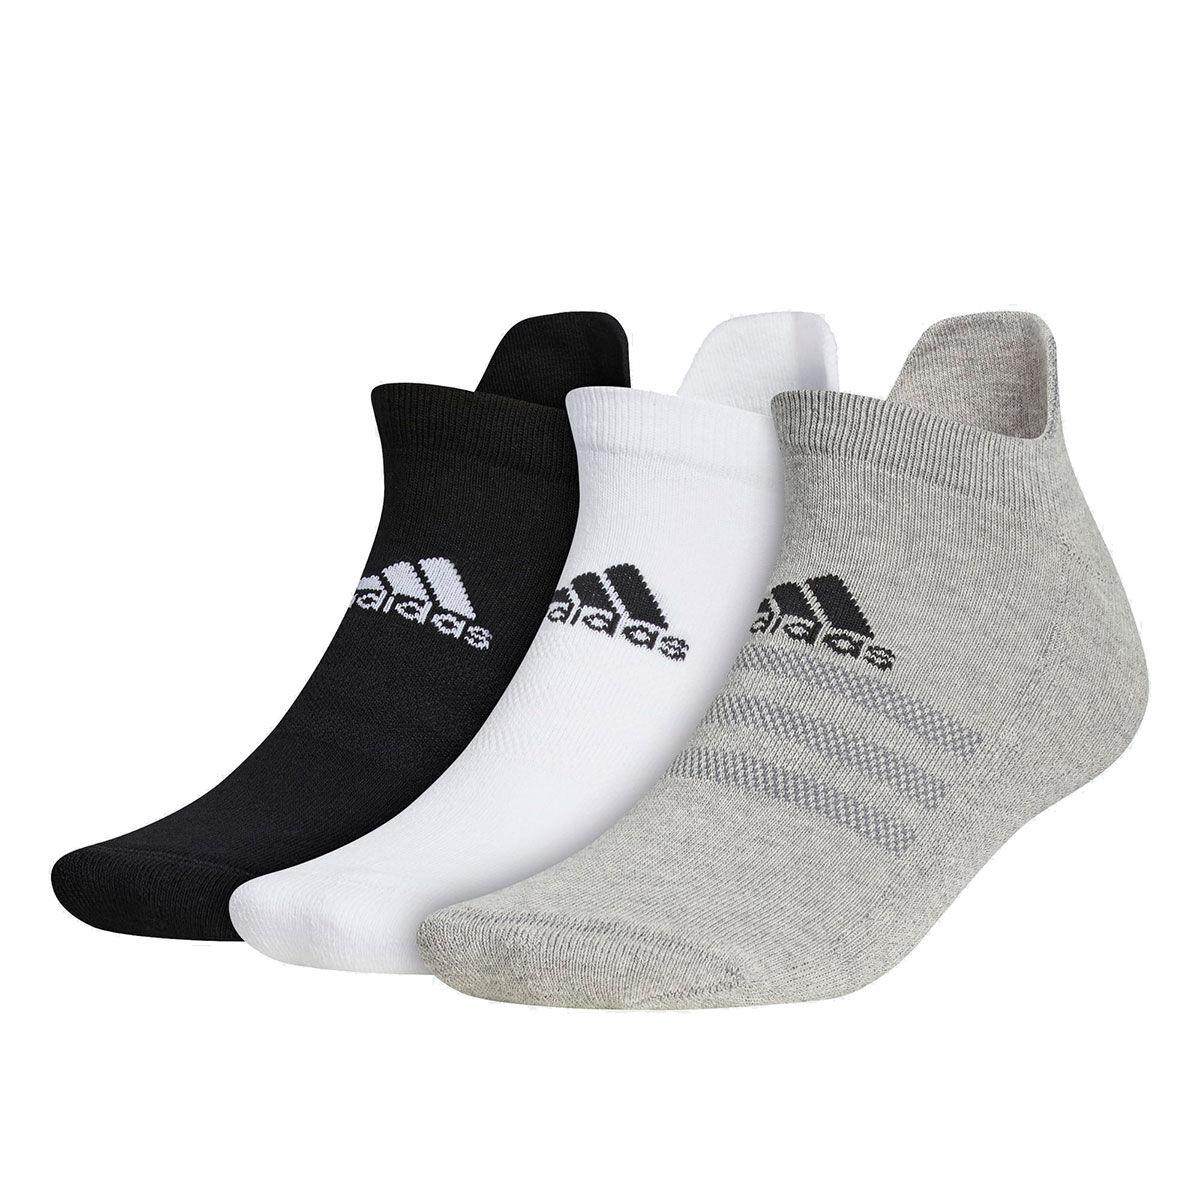 adidas Golf 3 Pack Ankle Socks, Mens, White/black/grey, 6.5-8 | American Golf